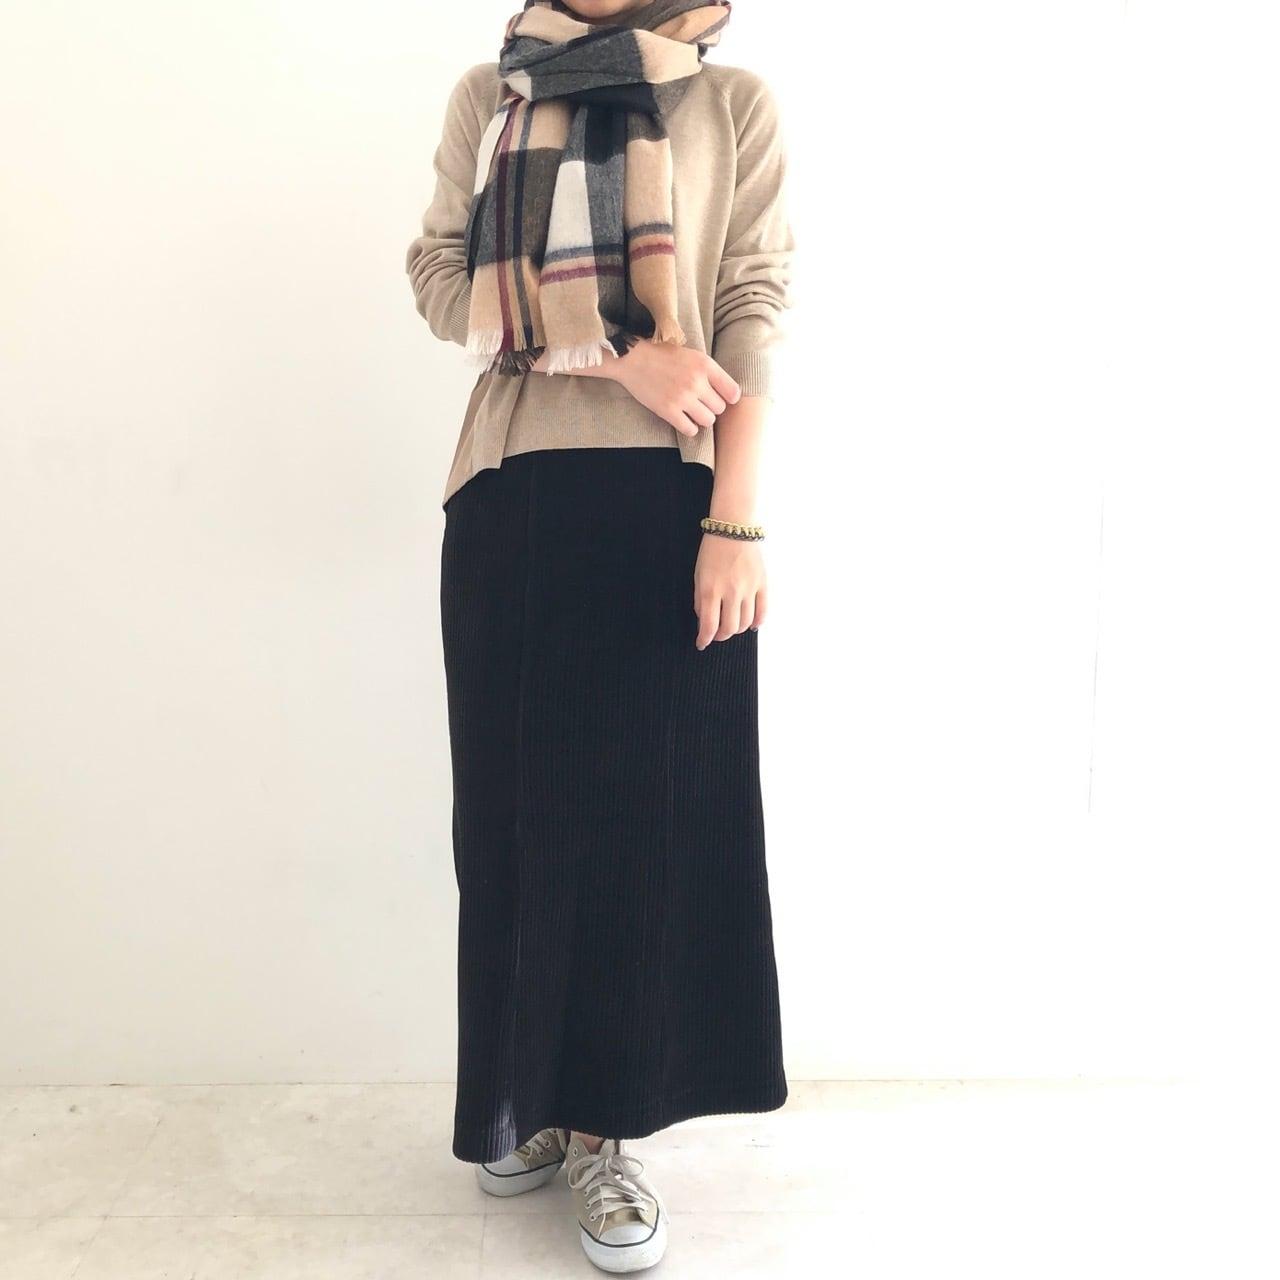 【 ROSIEE 】- 190203 - コーデュロイAラインスカート